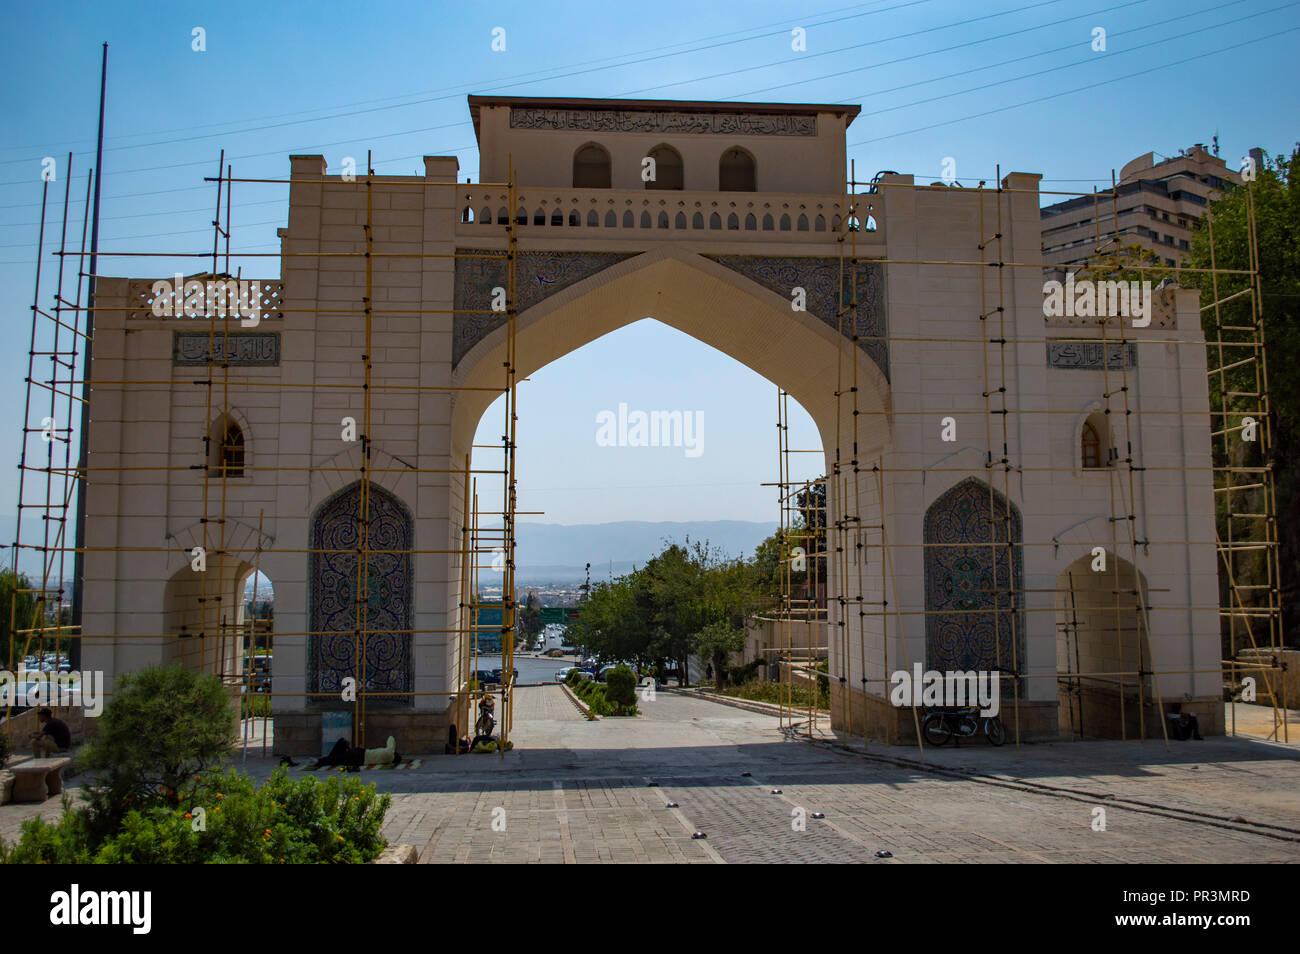 The Qu'ran Gate in Shiraz, Iran - Stock Image